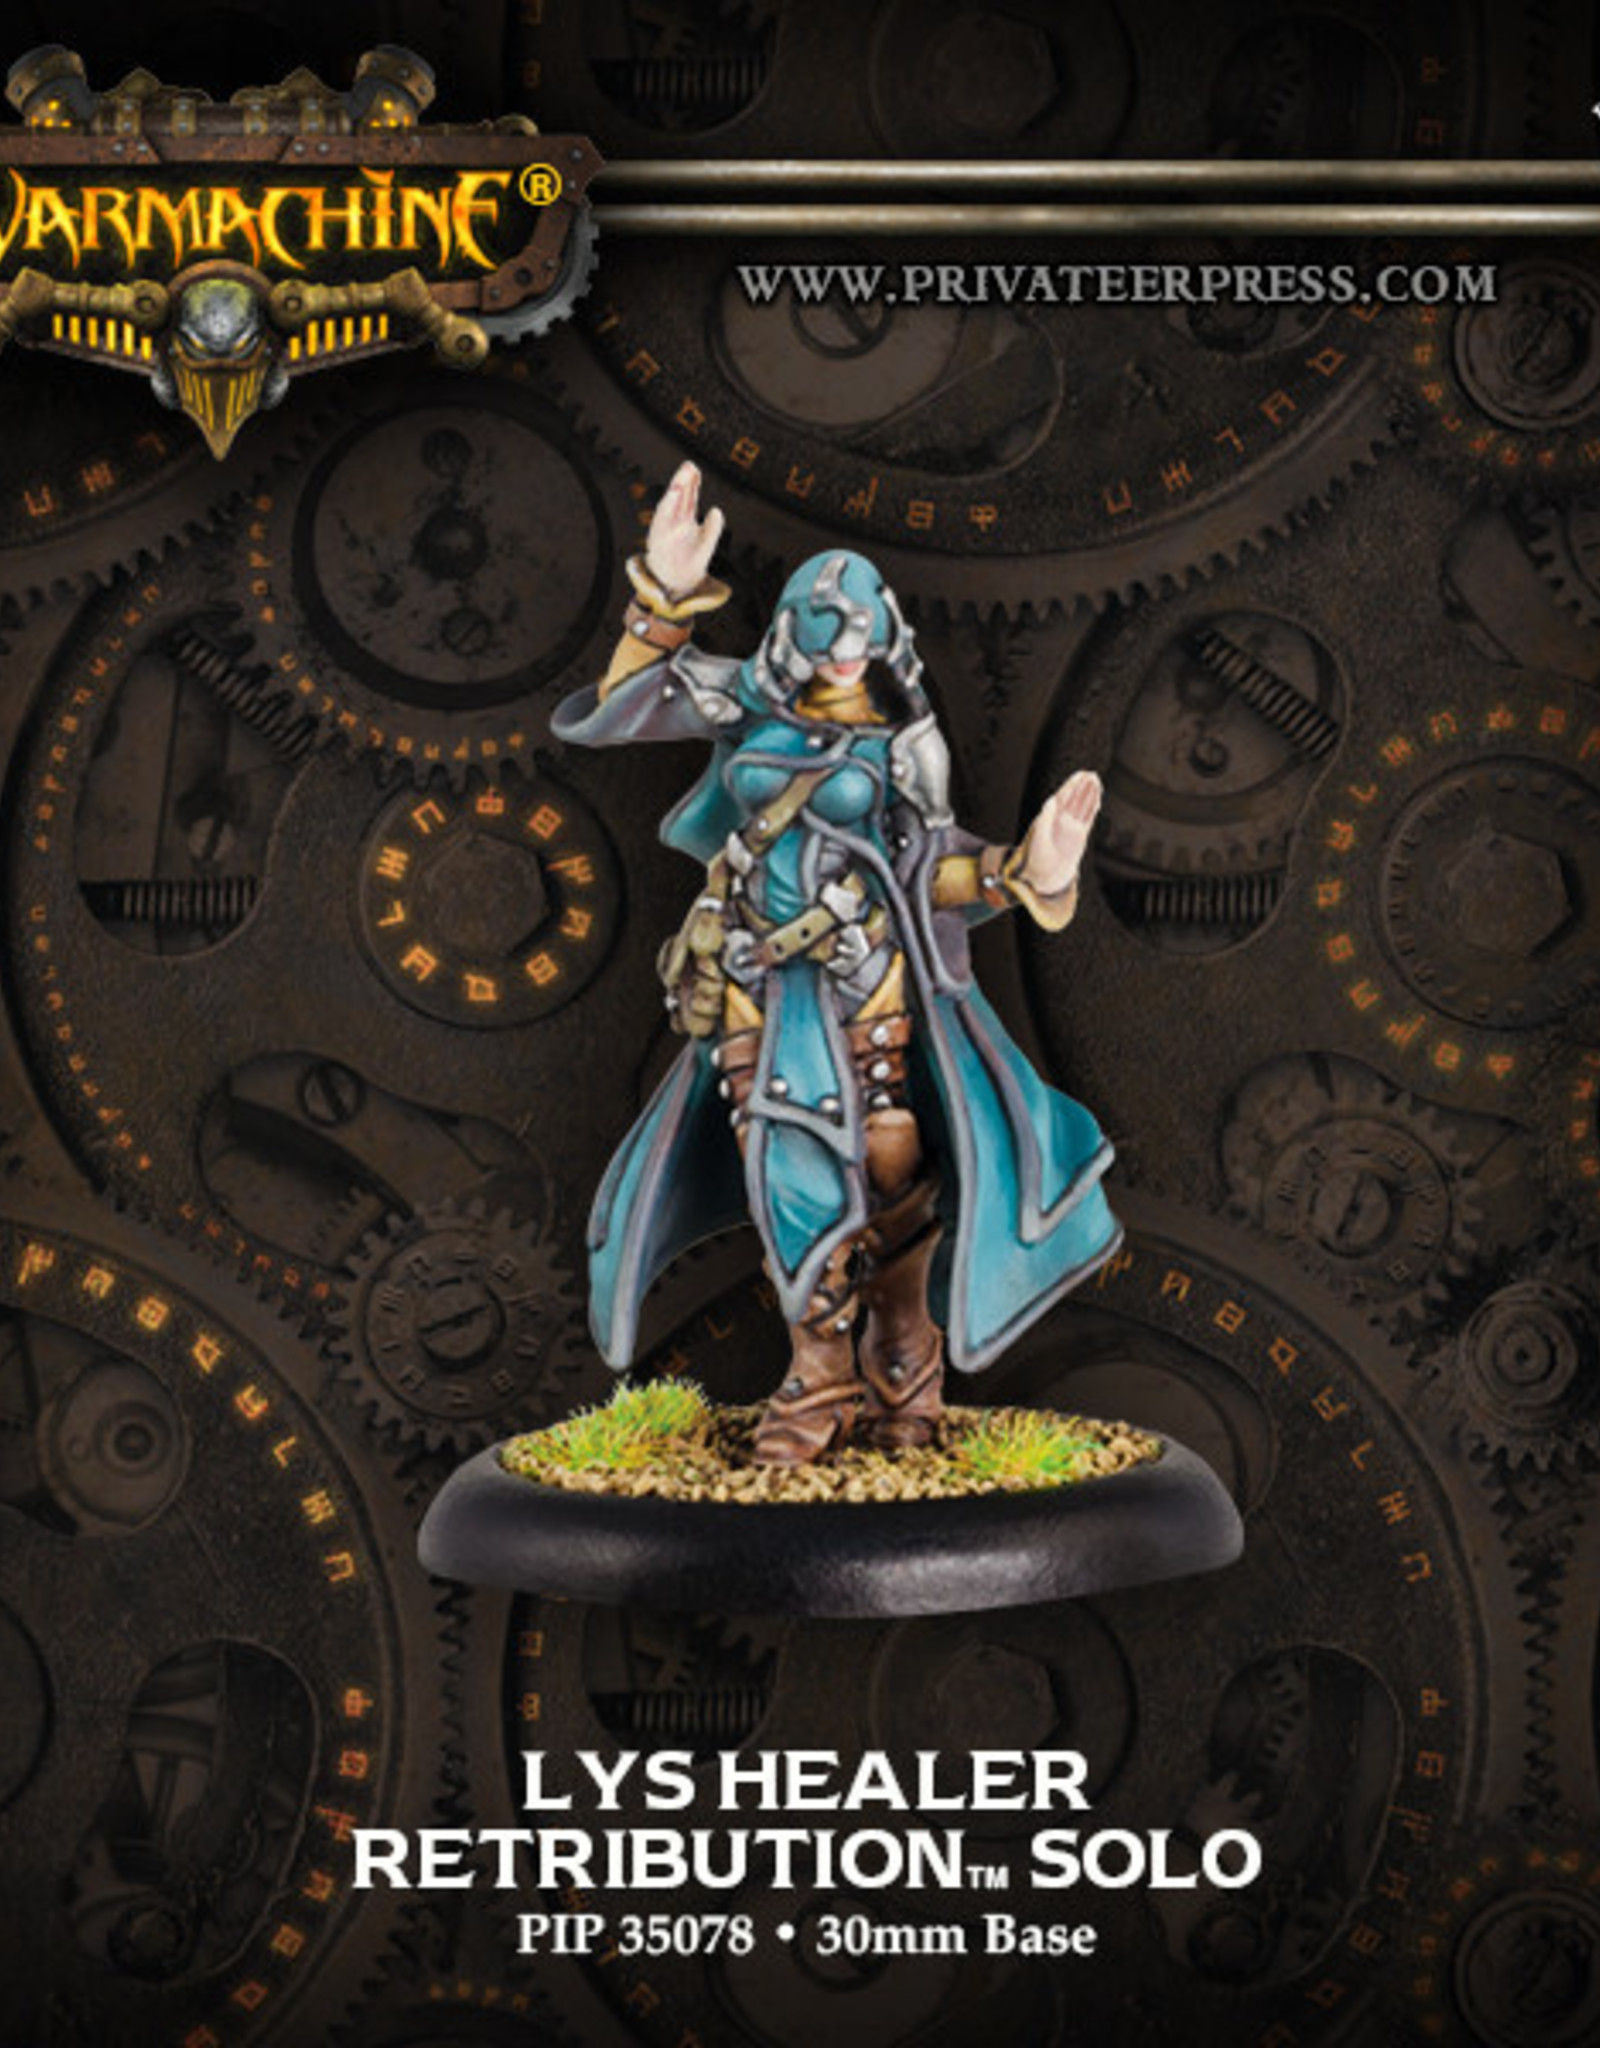 Warmachine Scyrah - Lys Healer